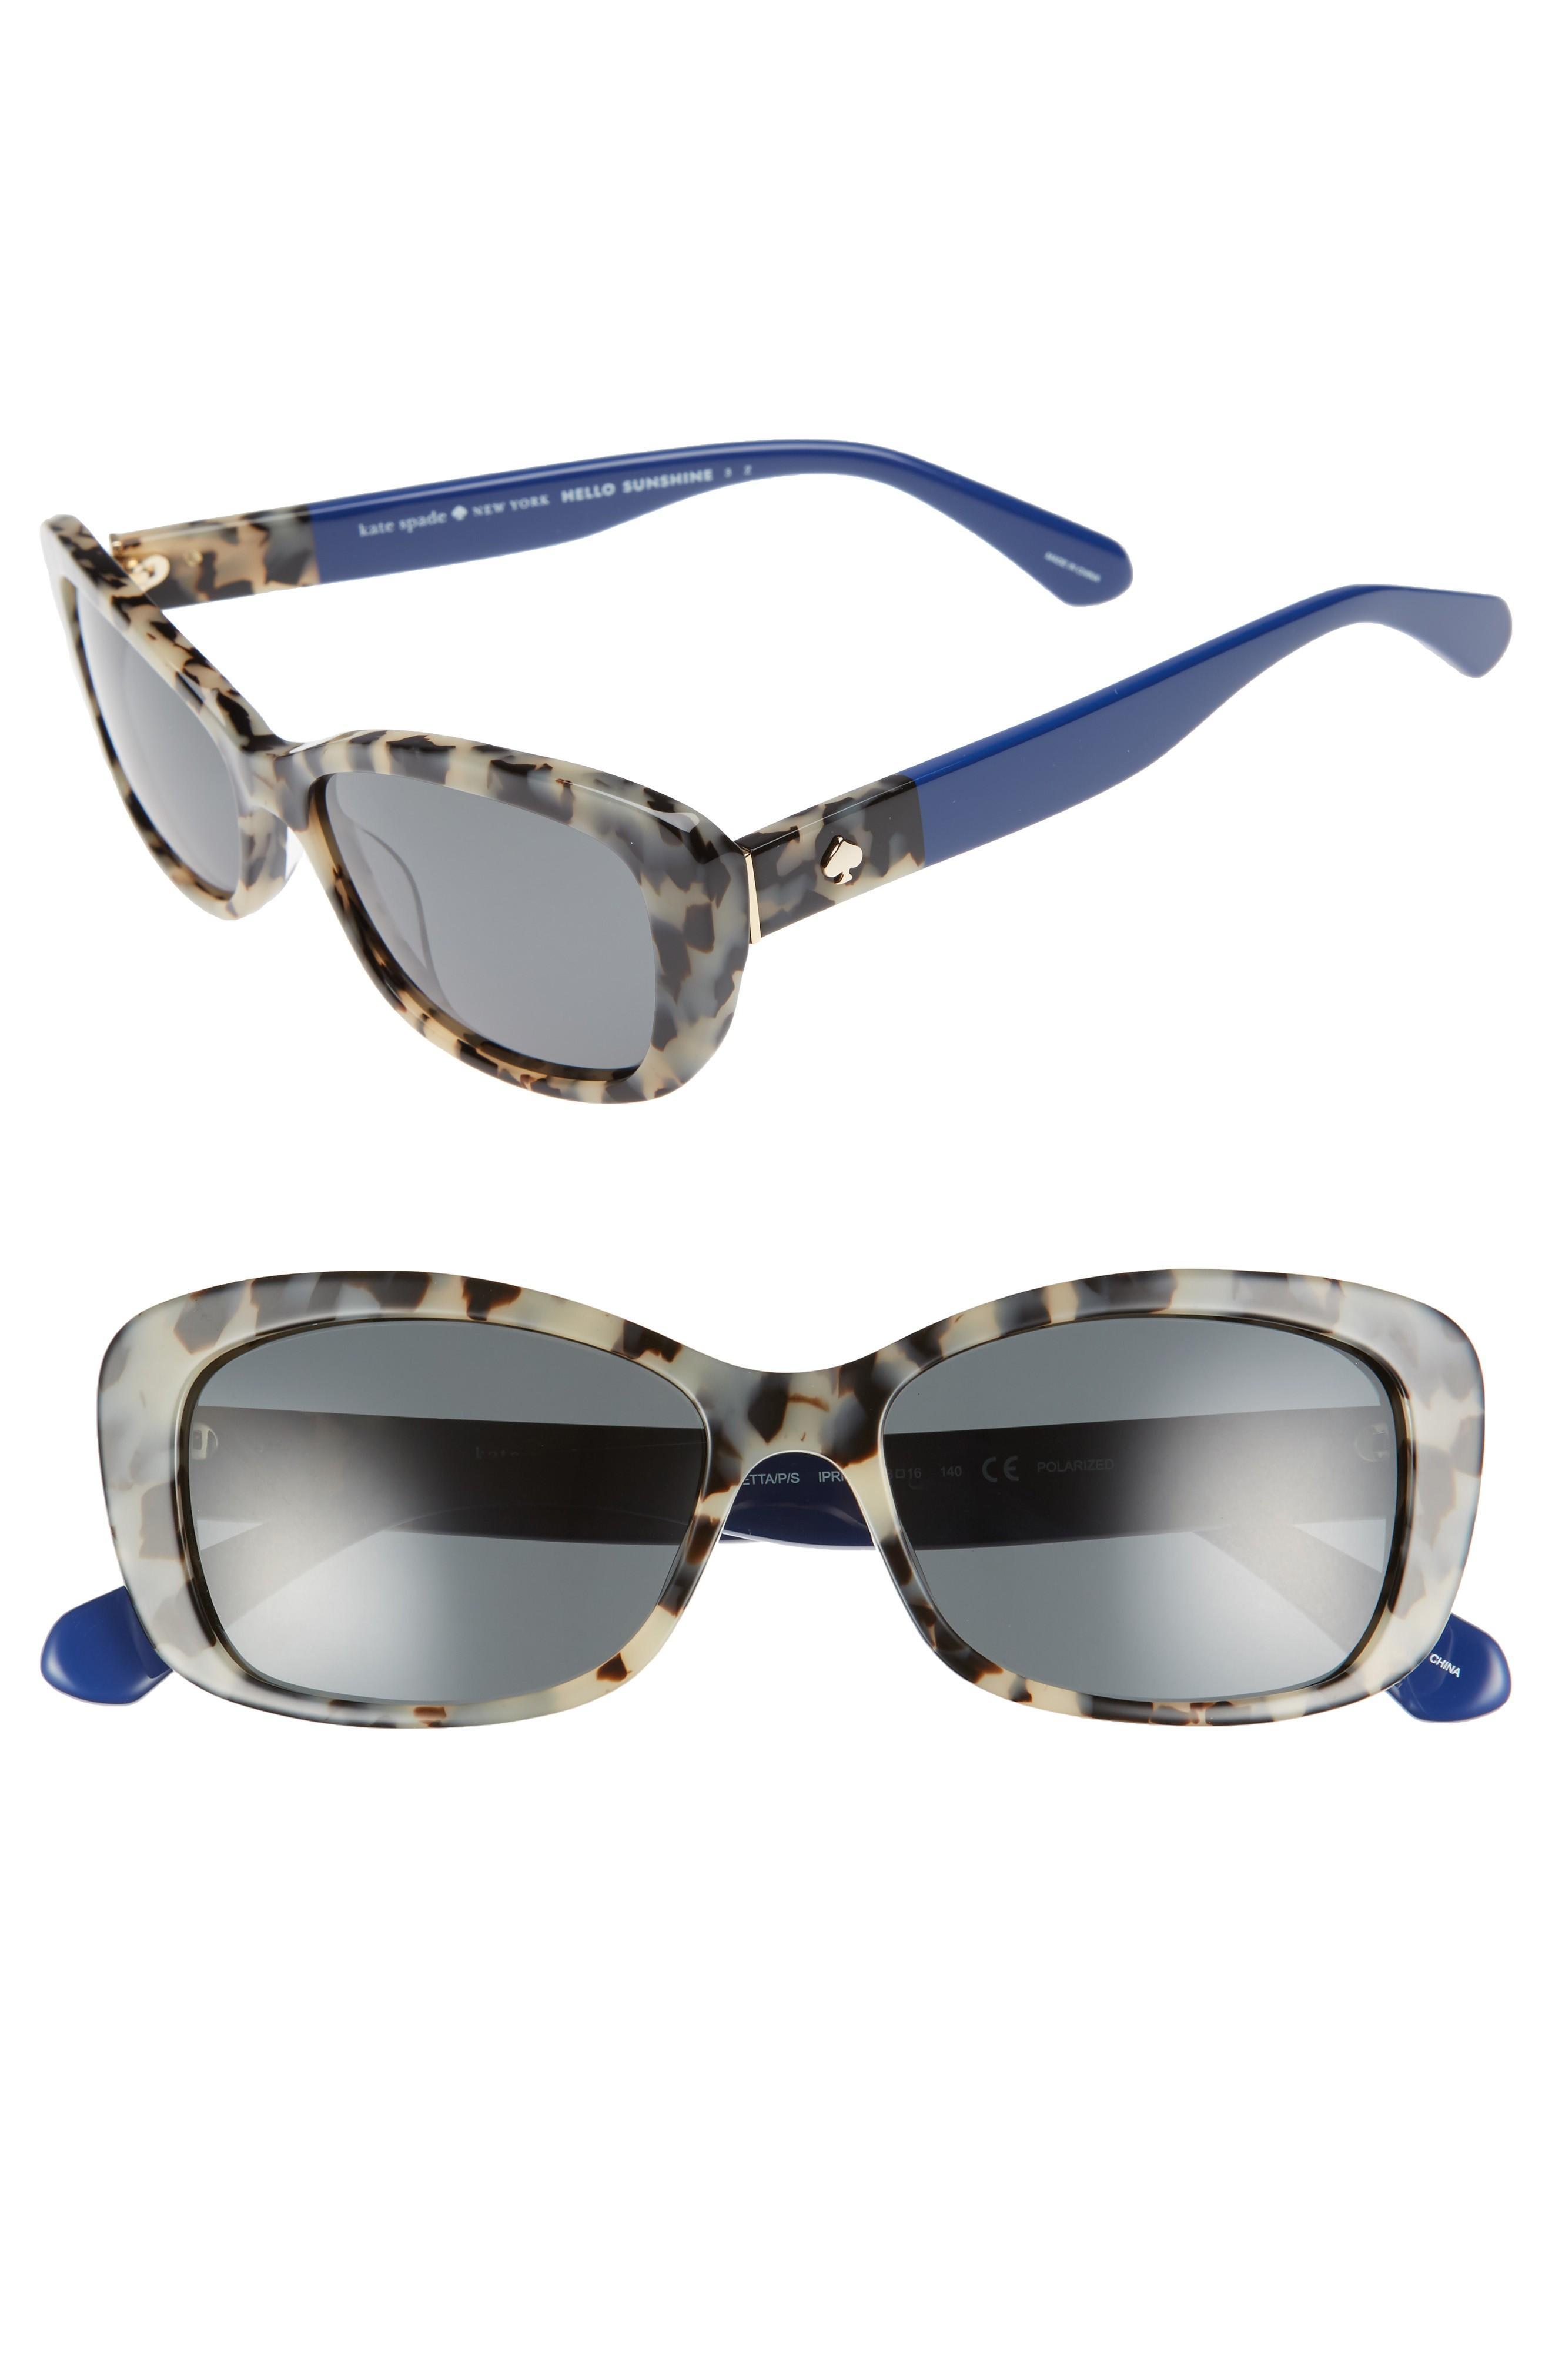 353e45b6546ca Kate Spade Claretta 53Mm Polarized Sunglasses - Havana  Blue